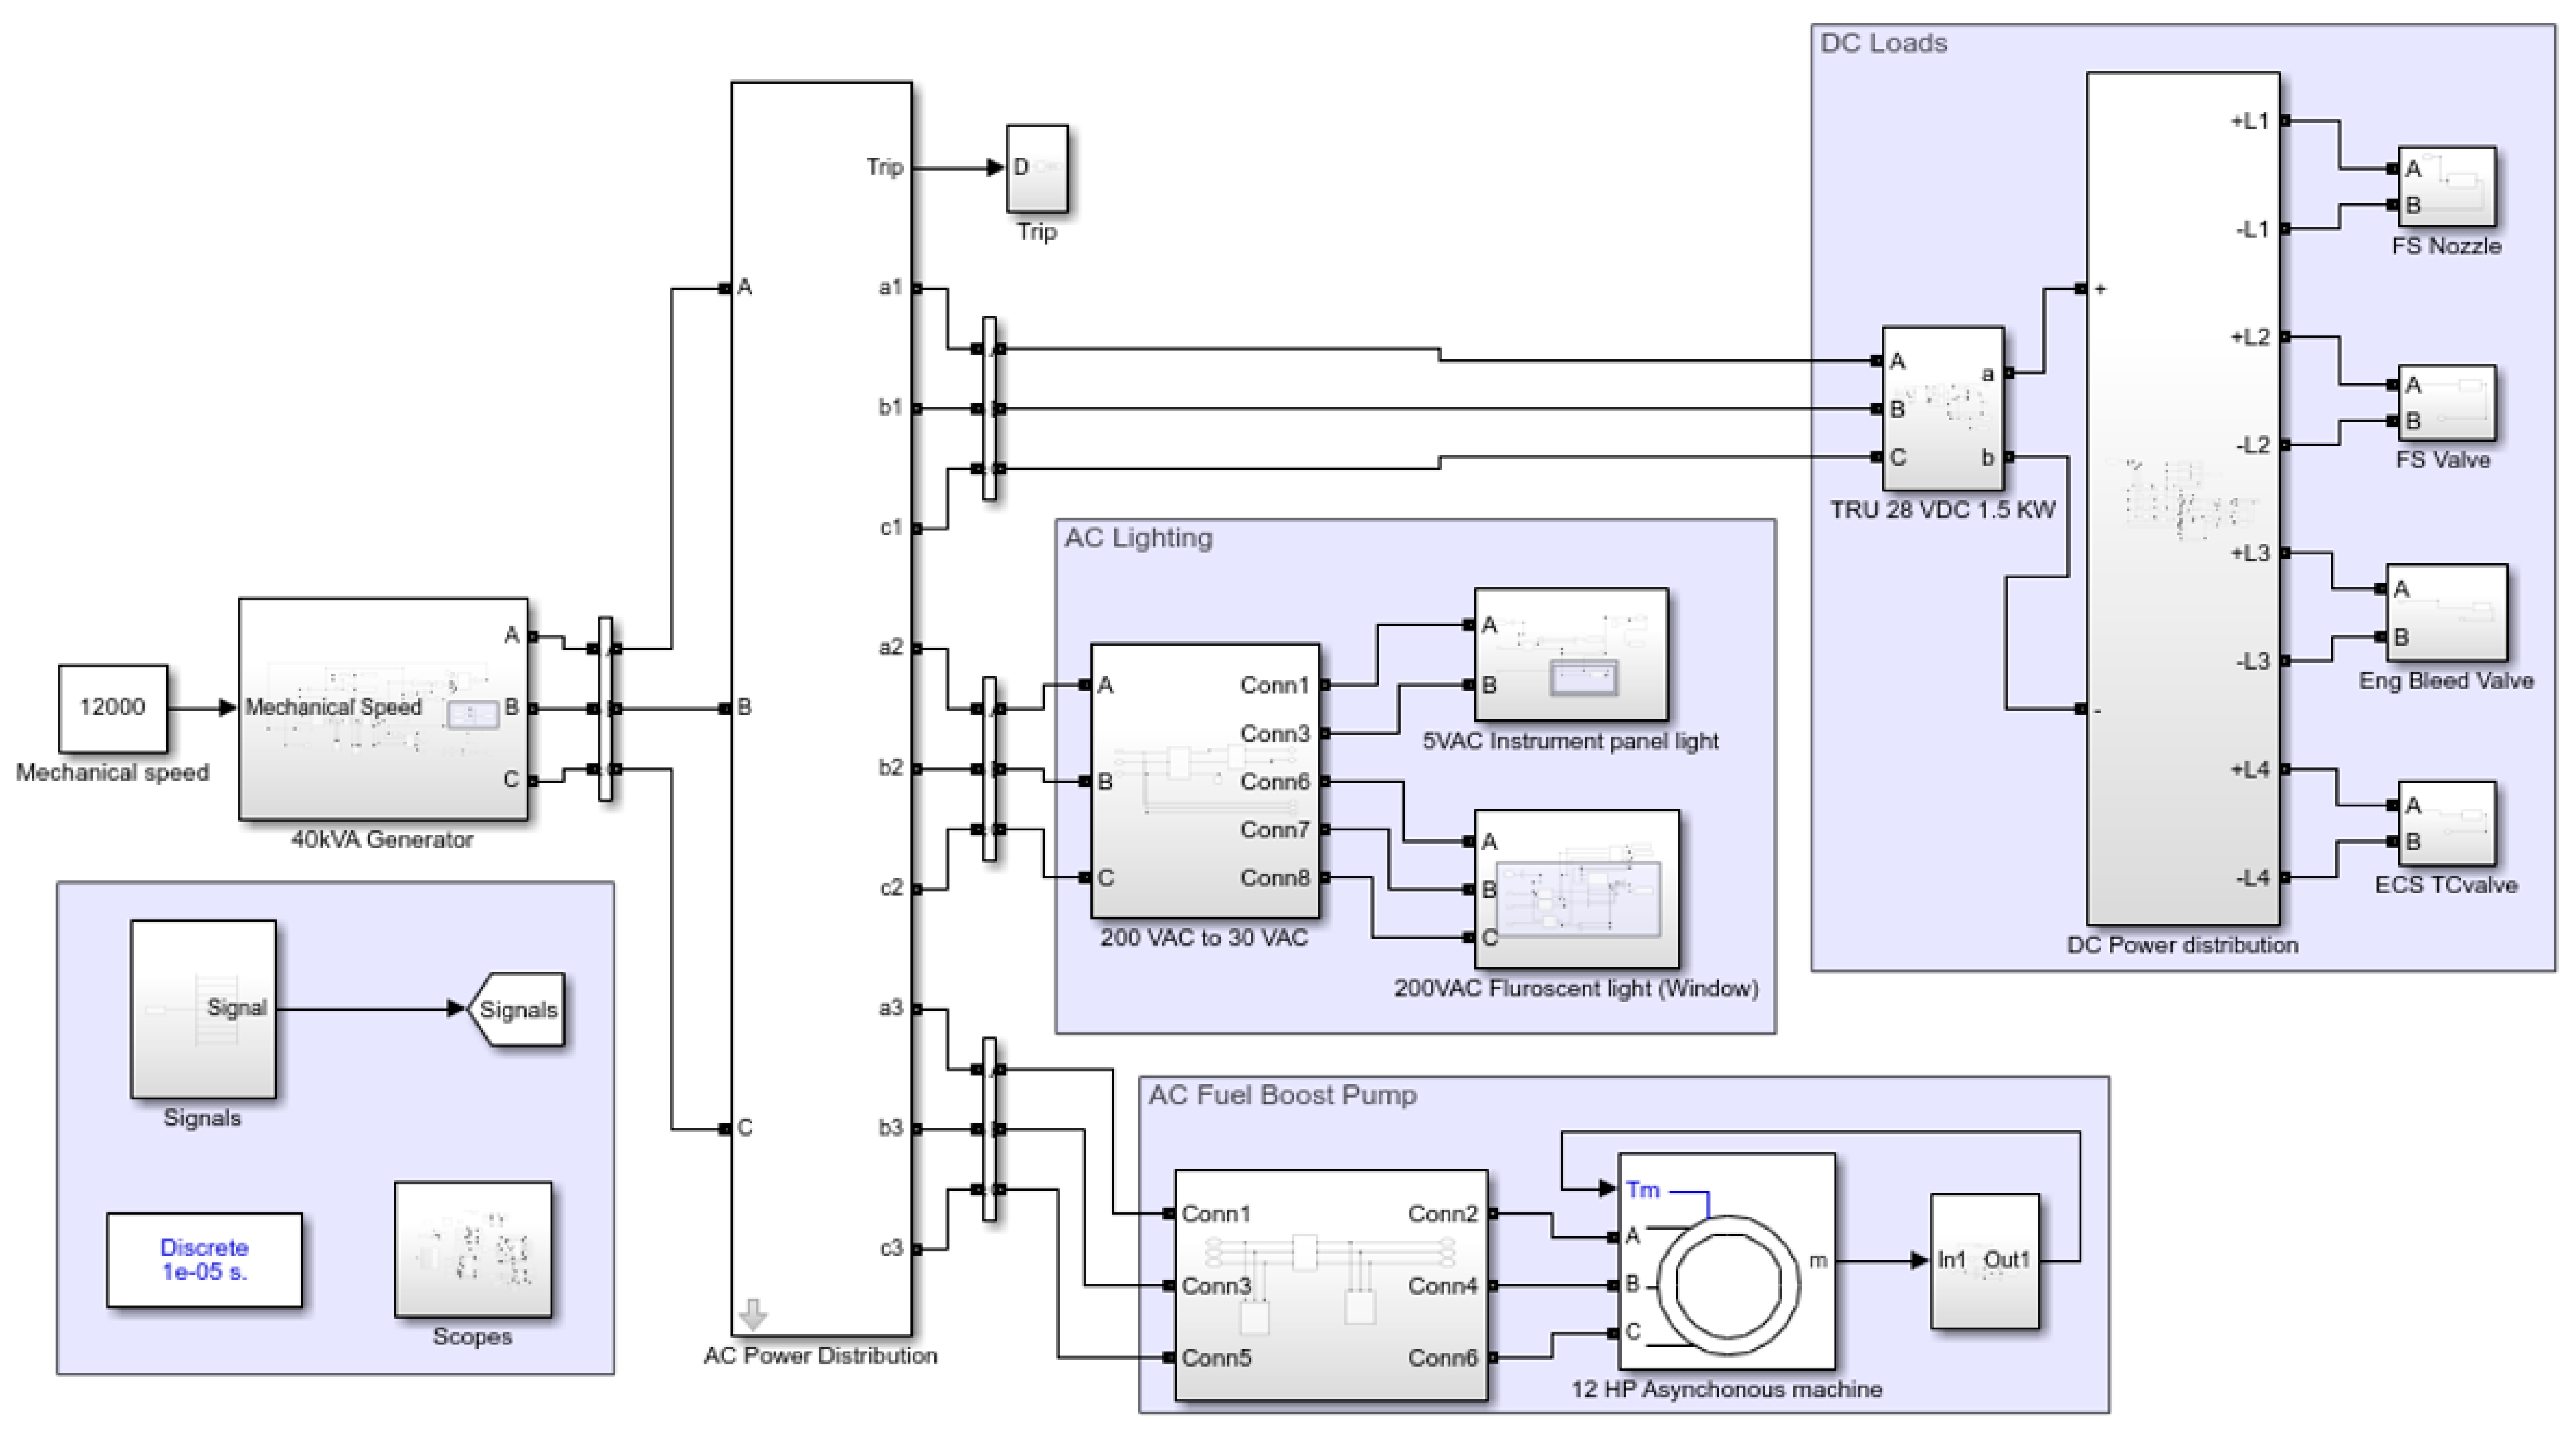 Matlab electrical model